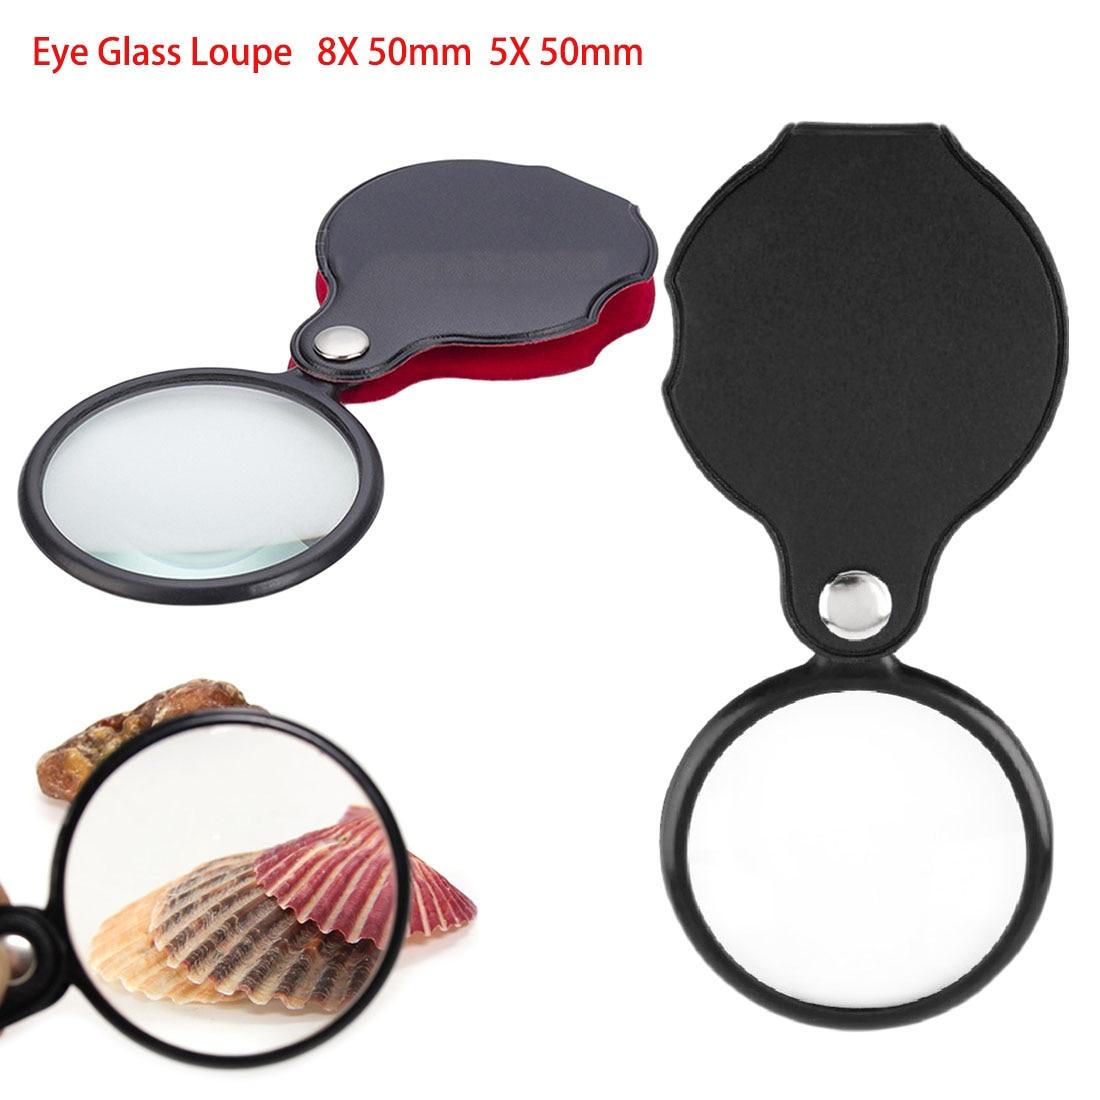 Mini Pocket 8X 50mm 5X 50mm Folding Jewelry Magnifier Magnifying Eye Glass Loupe Lens